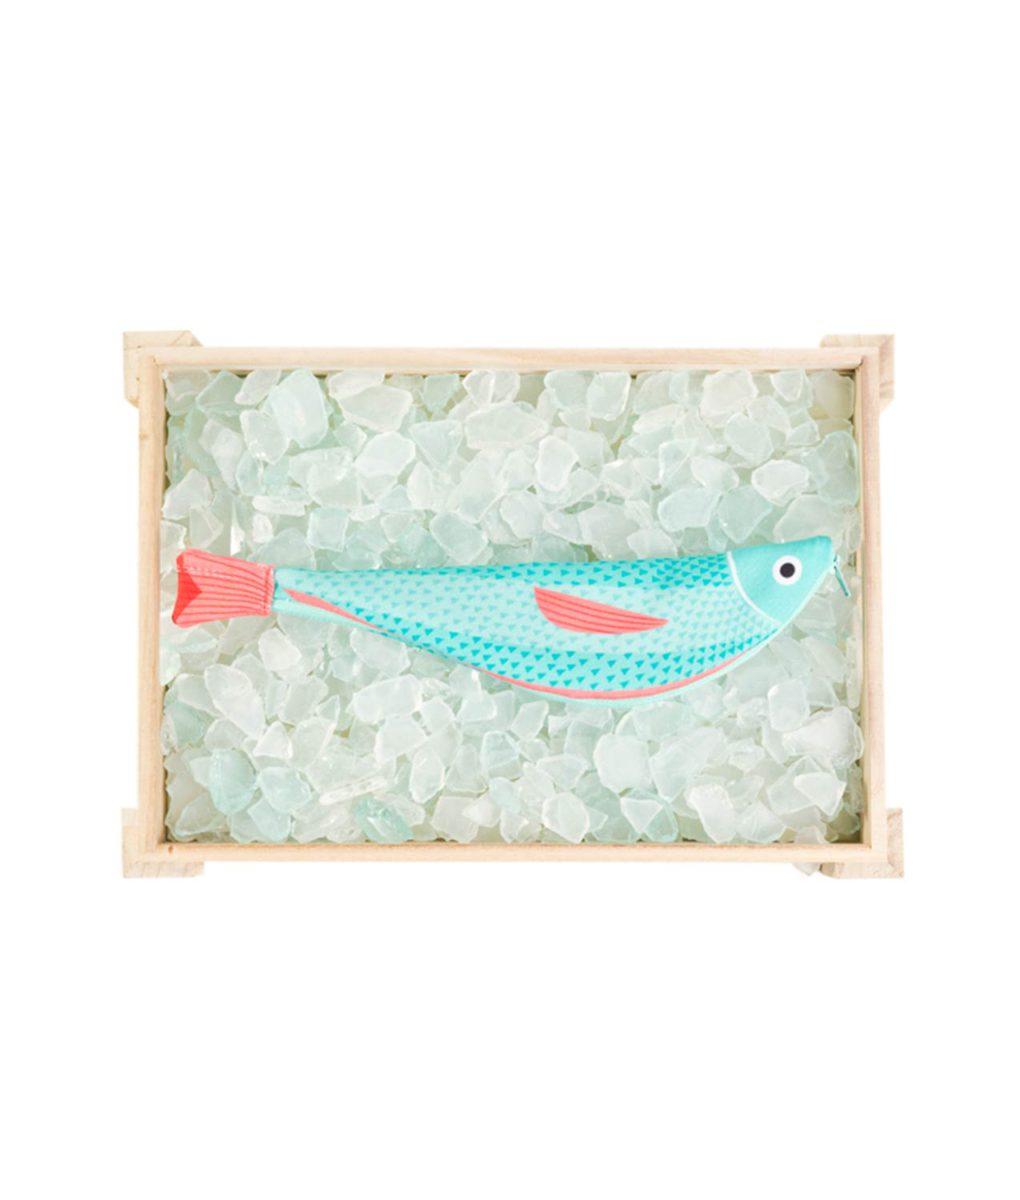 verdin-cerrado-estuche-don-fisher